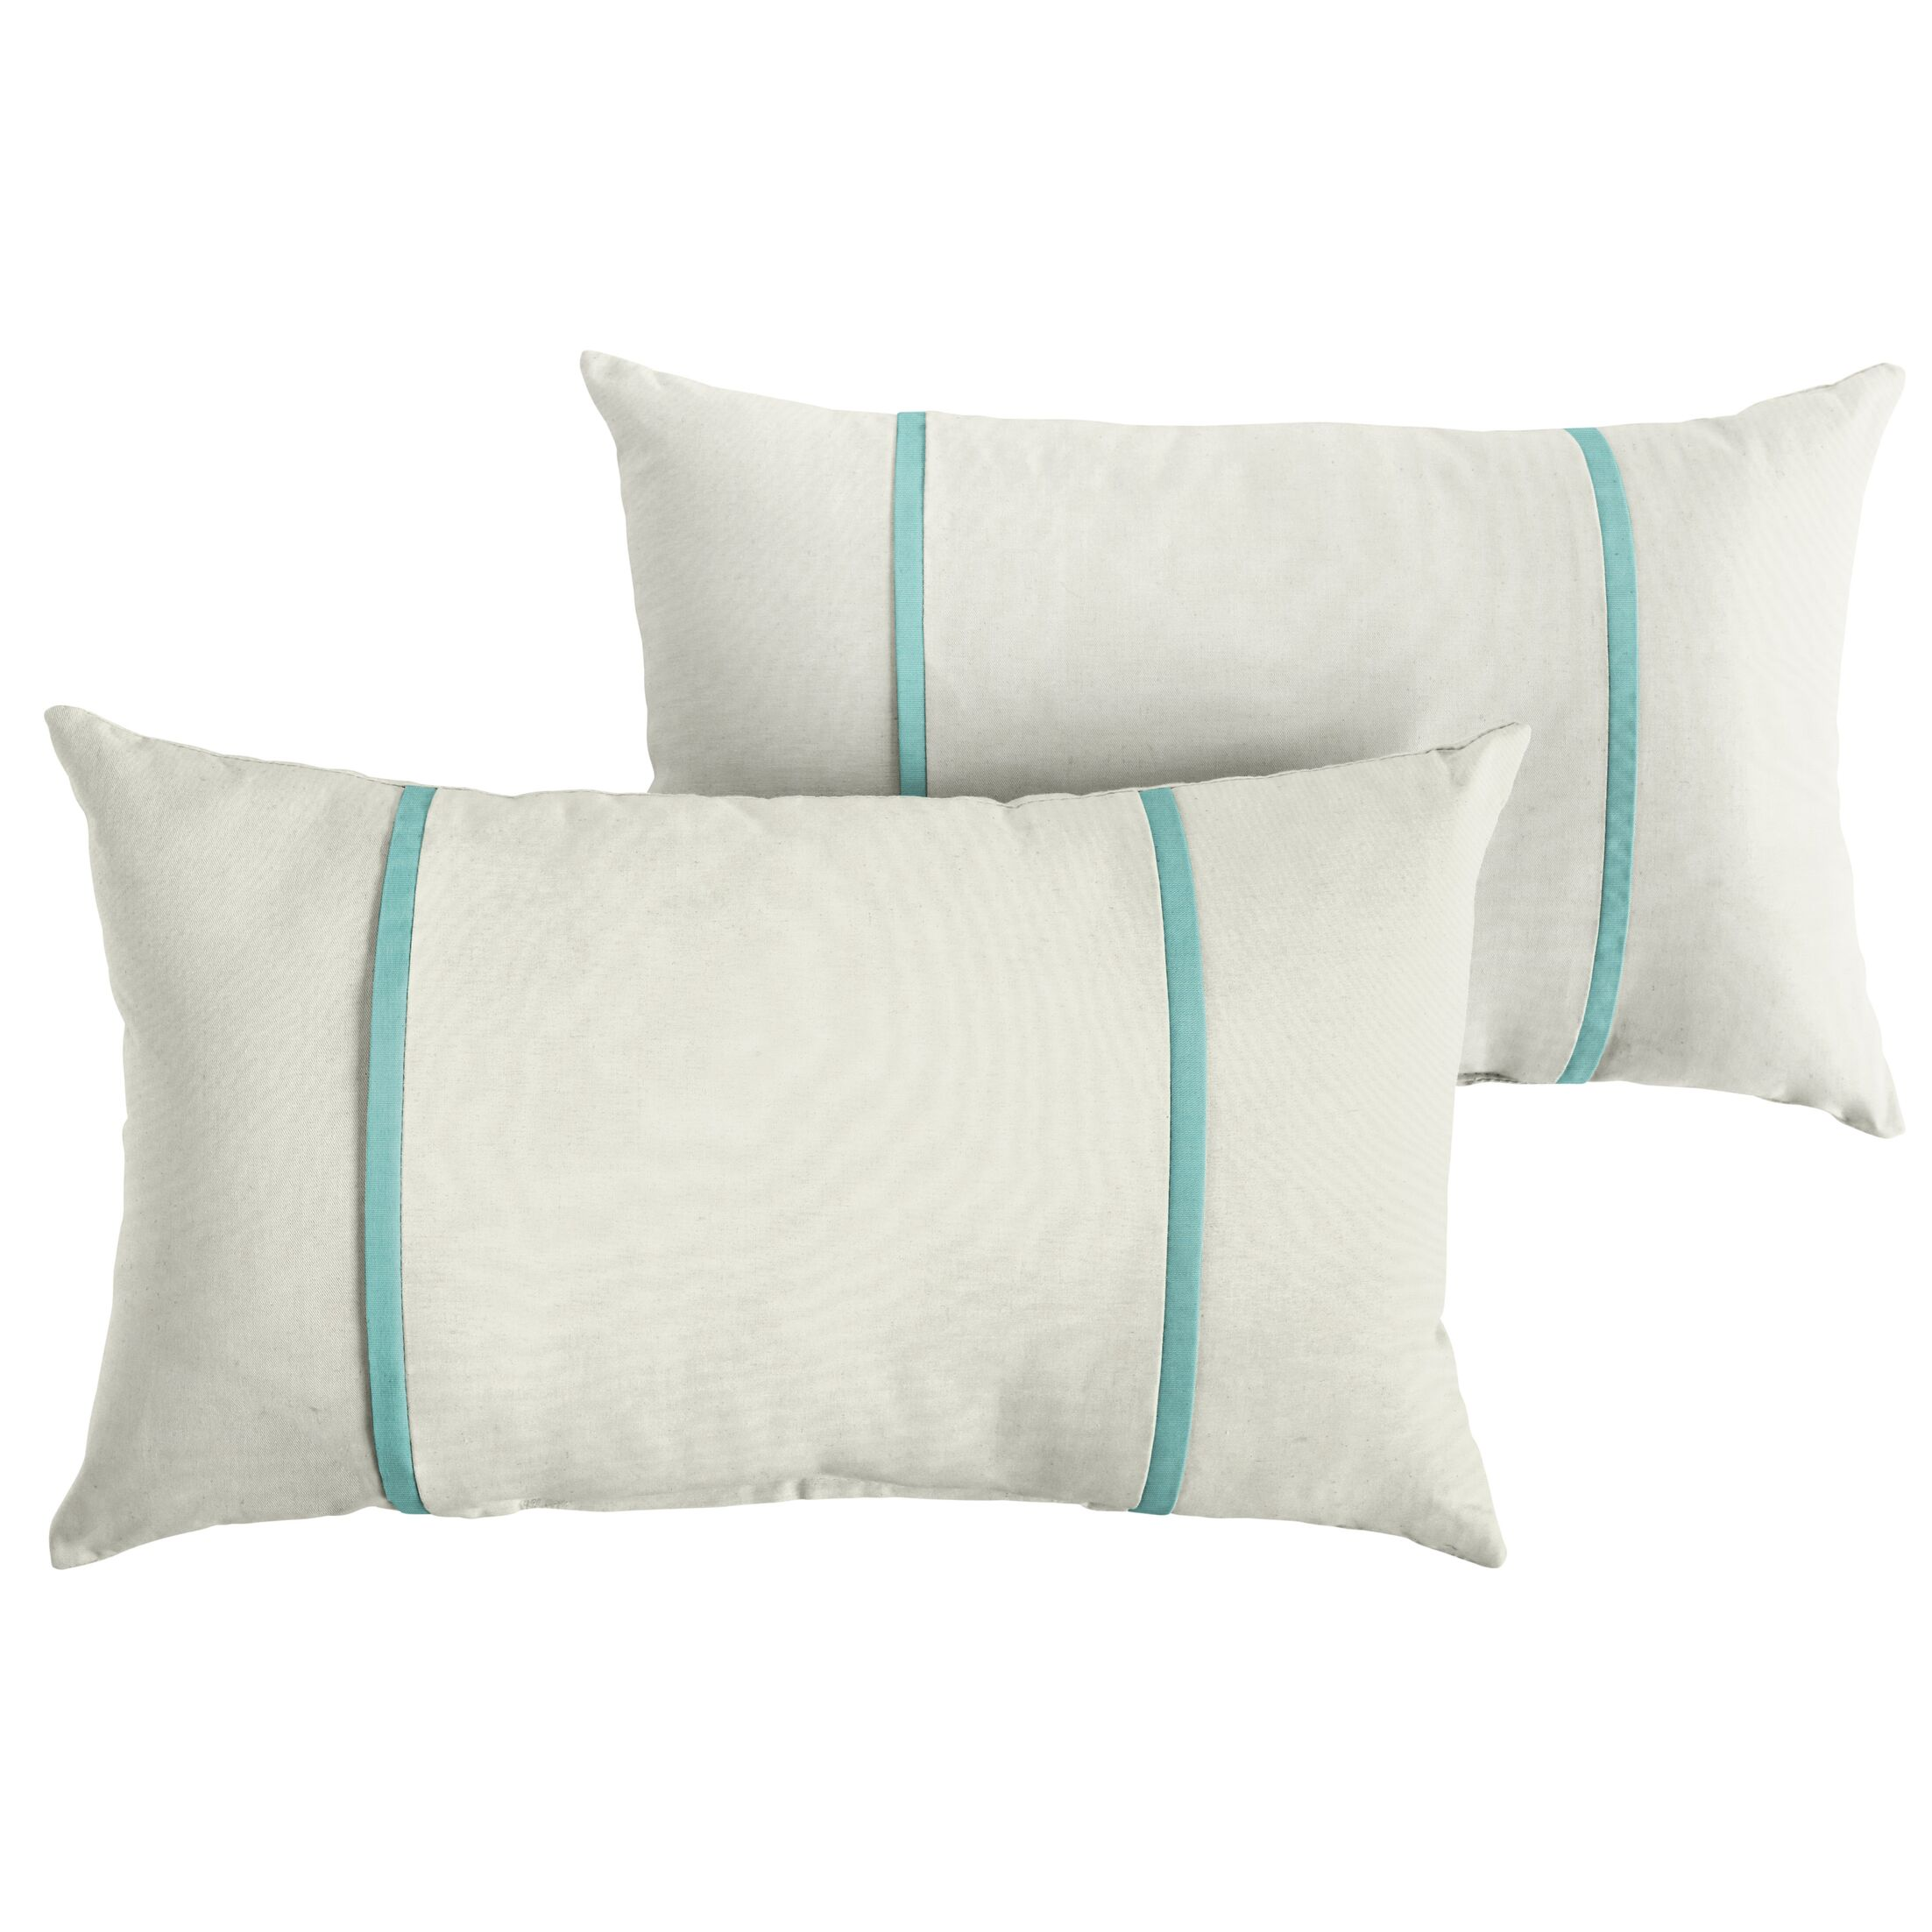 Cifuentes Indoor/Outdoor Sunbrella Lumbar Pillow